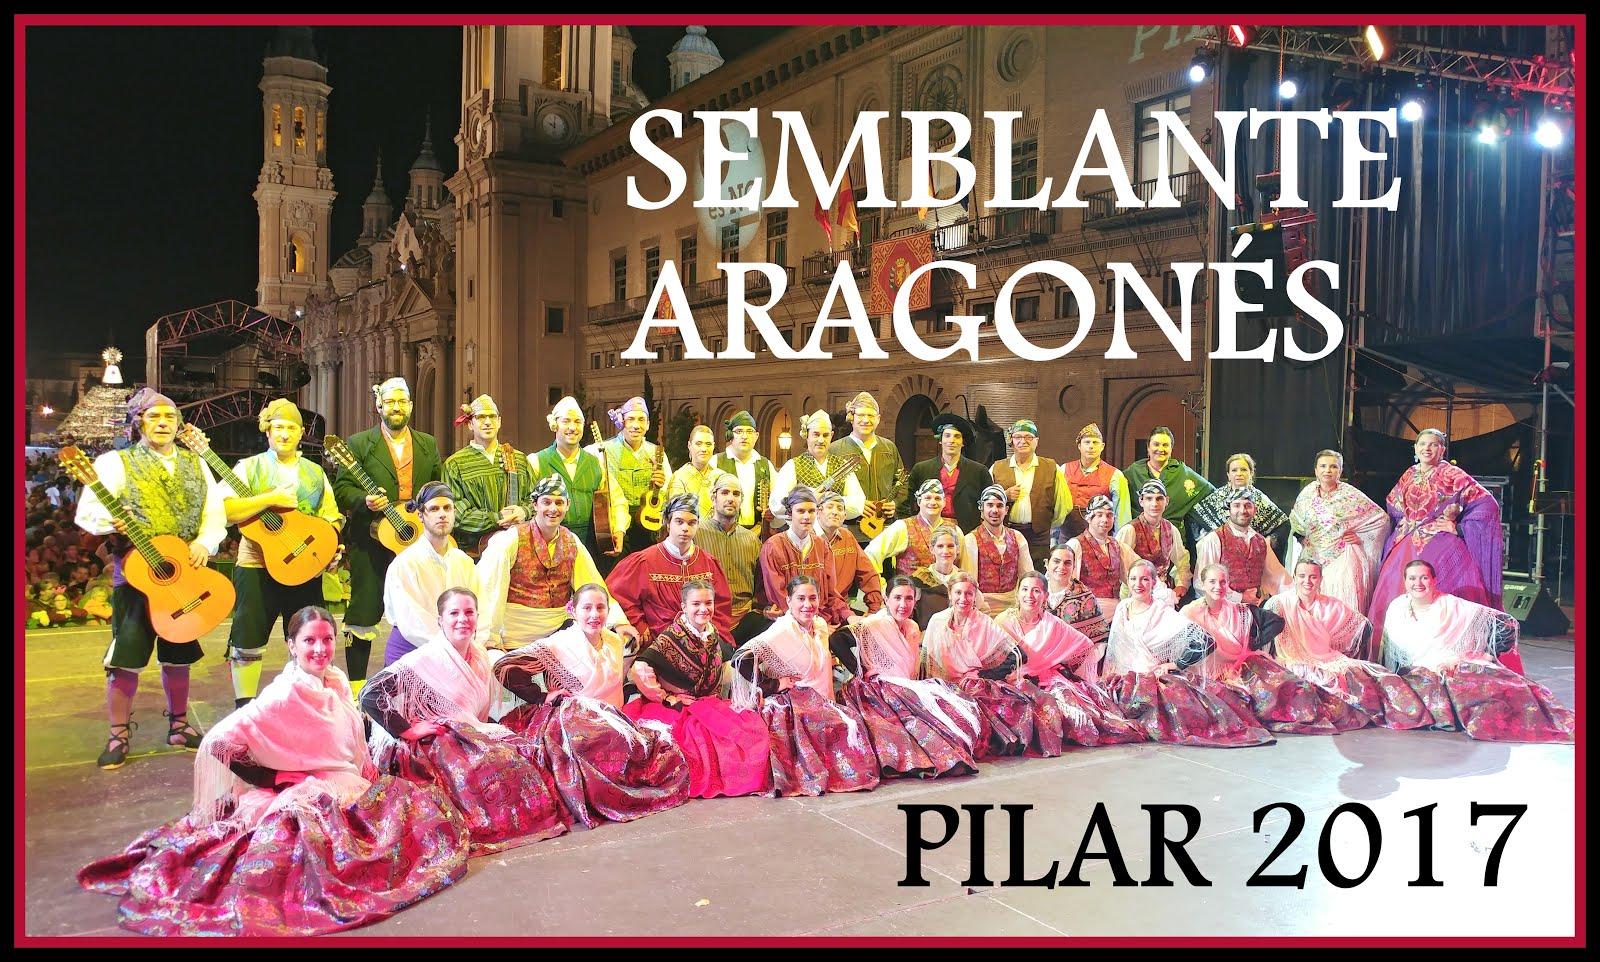 PILAR 2017